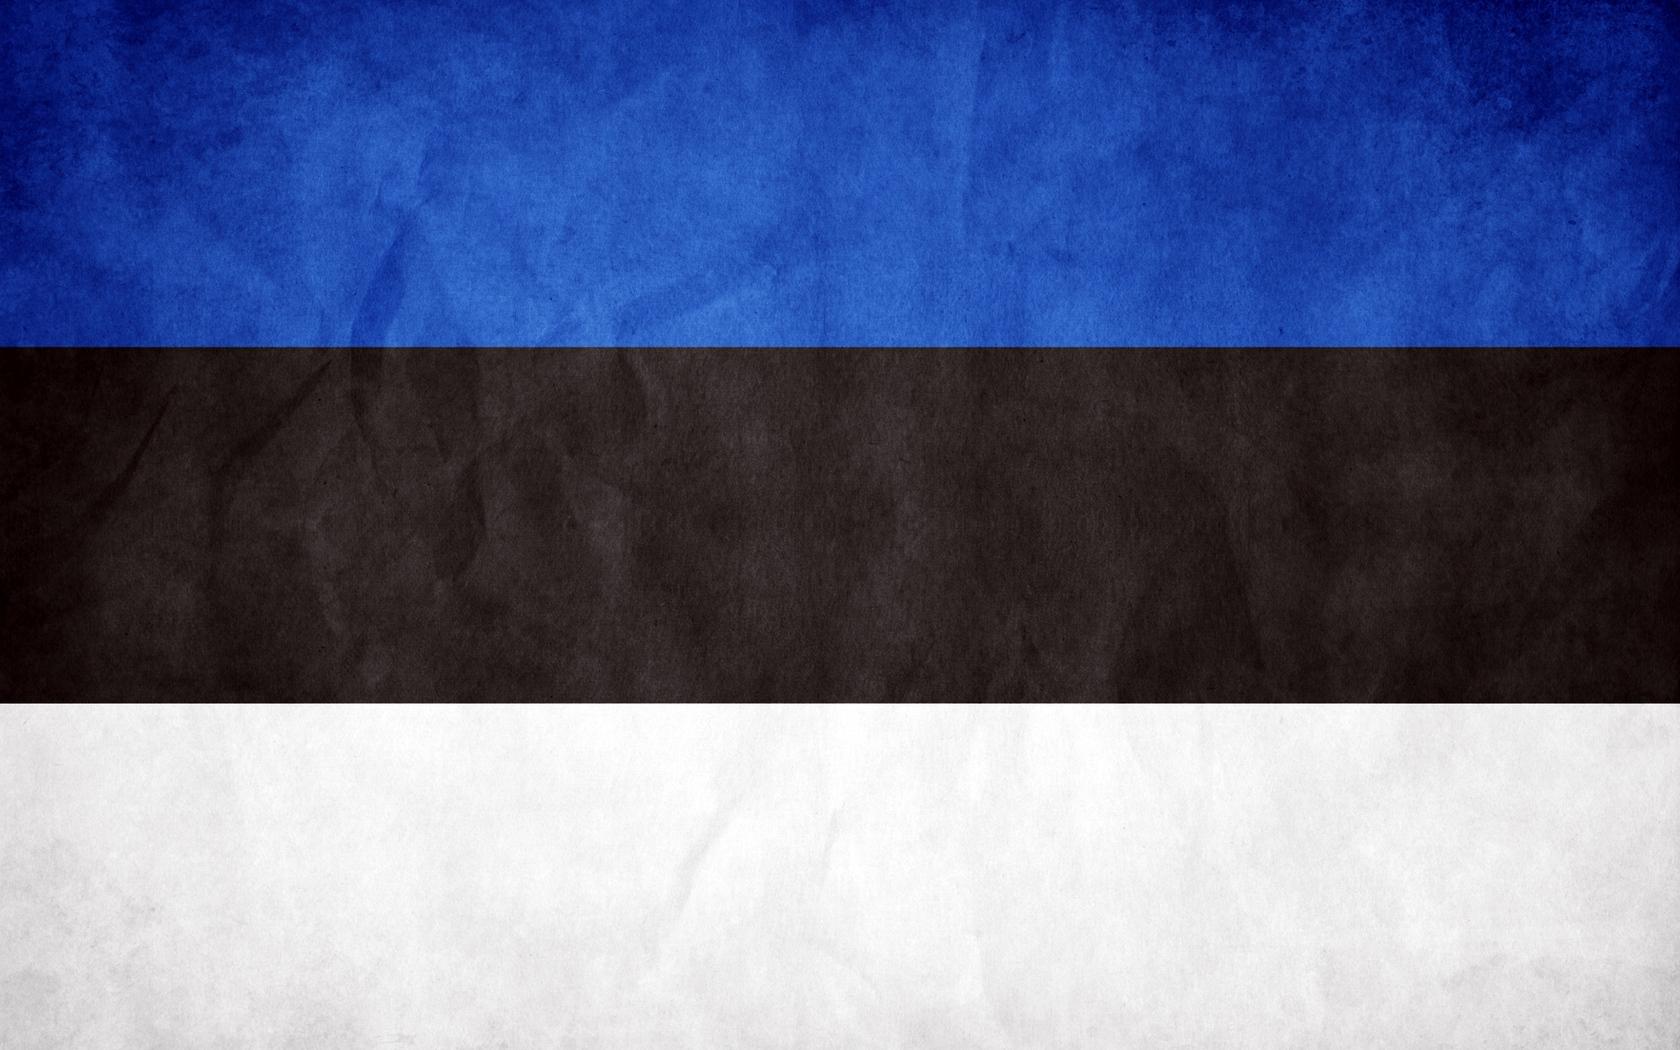 Estonia Line Flag Color Background Texture   Stock Photos 1680x1050